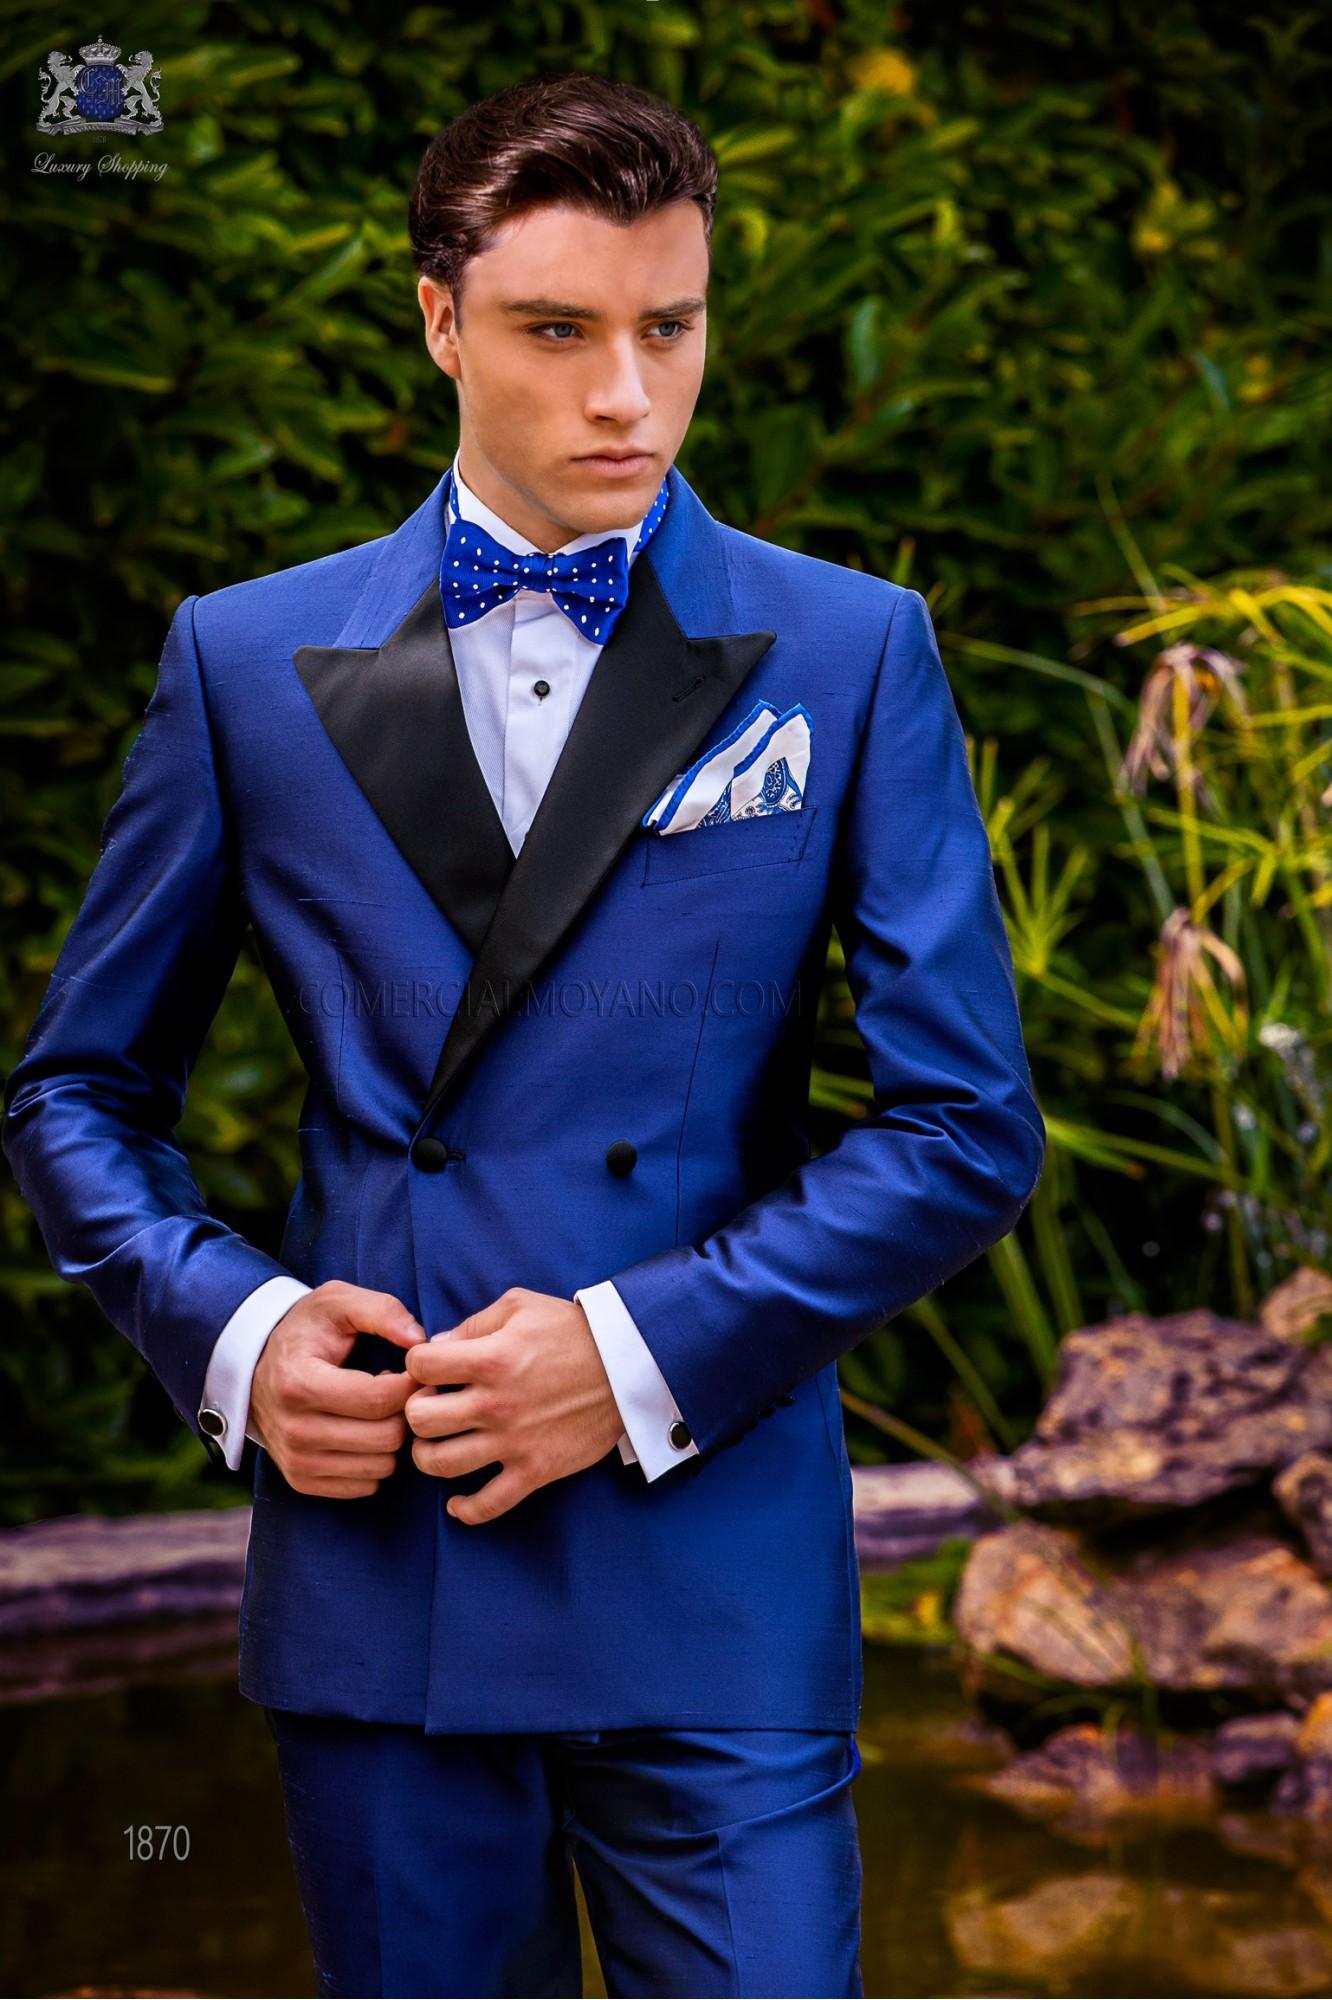 Esmoquin azul royal cruzado en shantung mixto seda